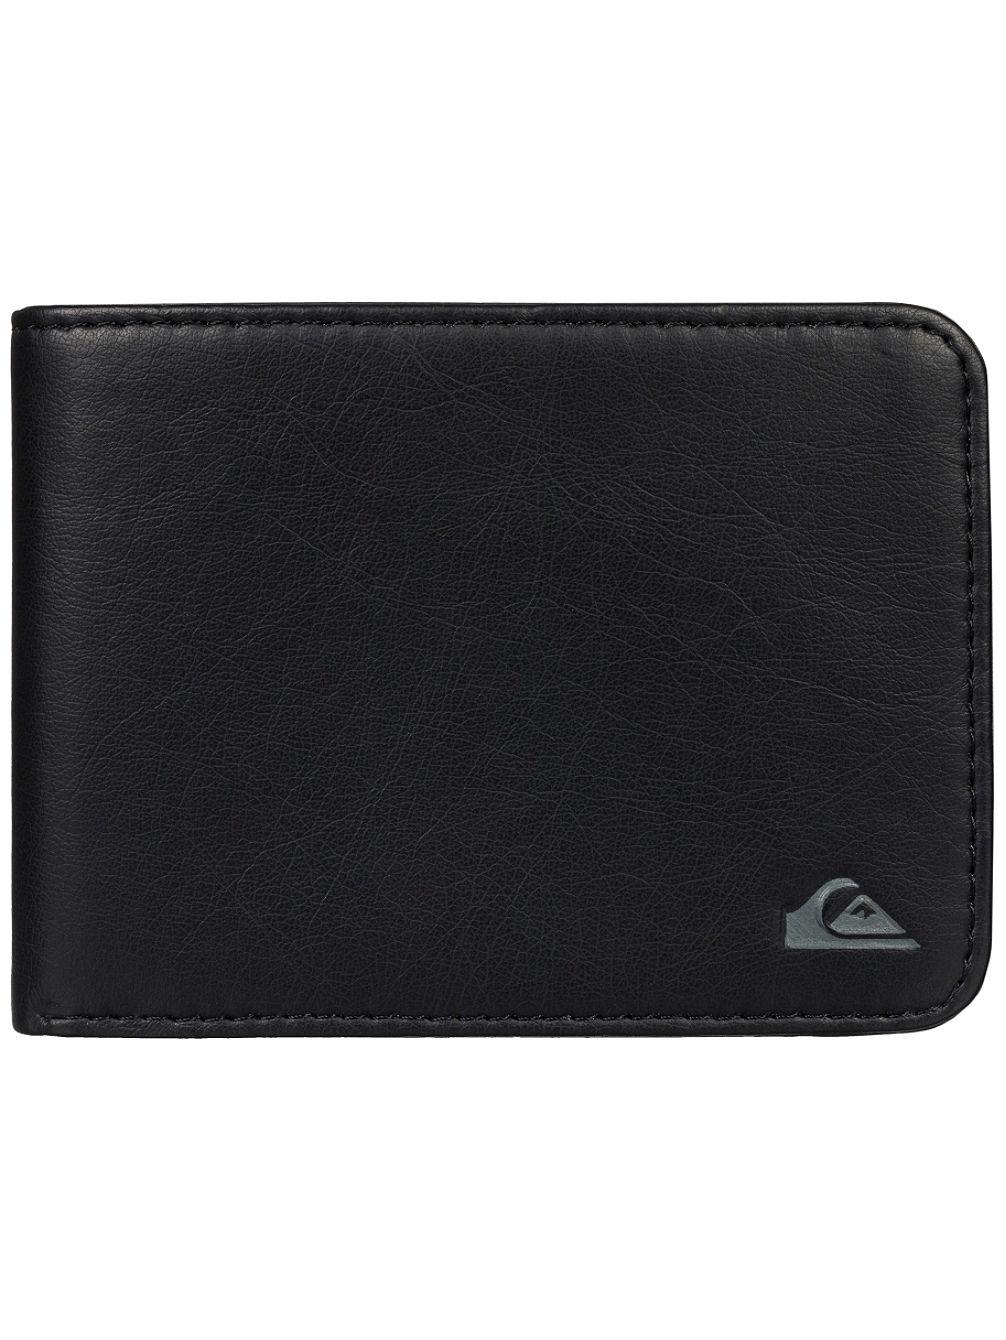 quiksilver-slim-vintage-wallet